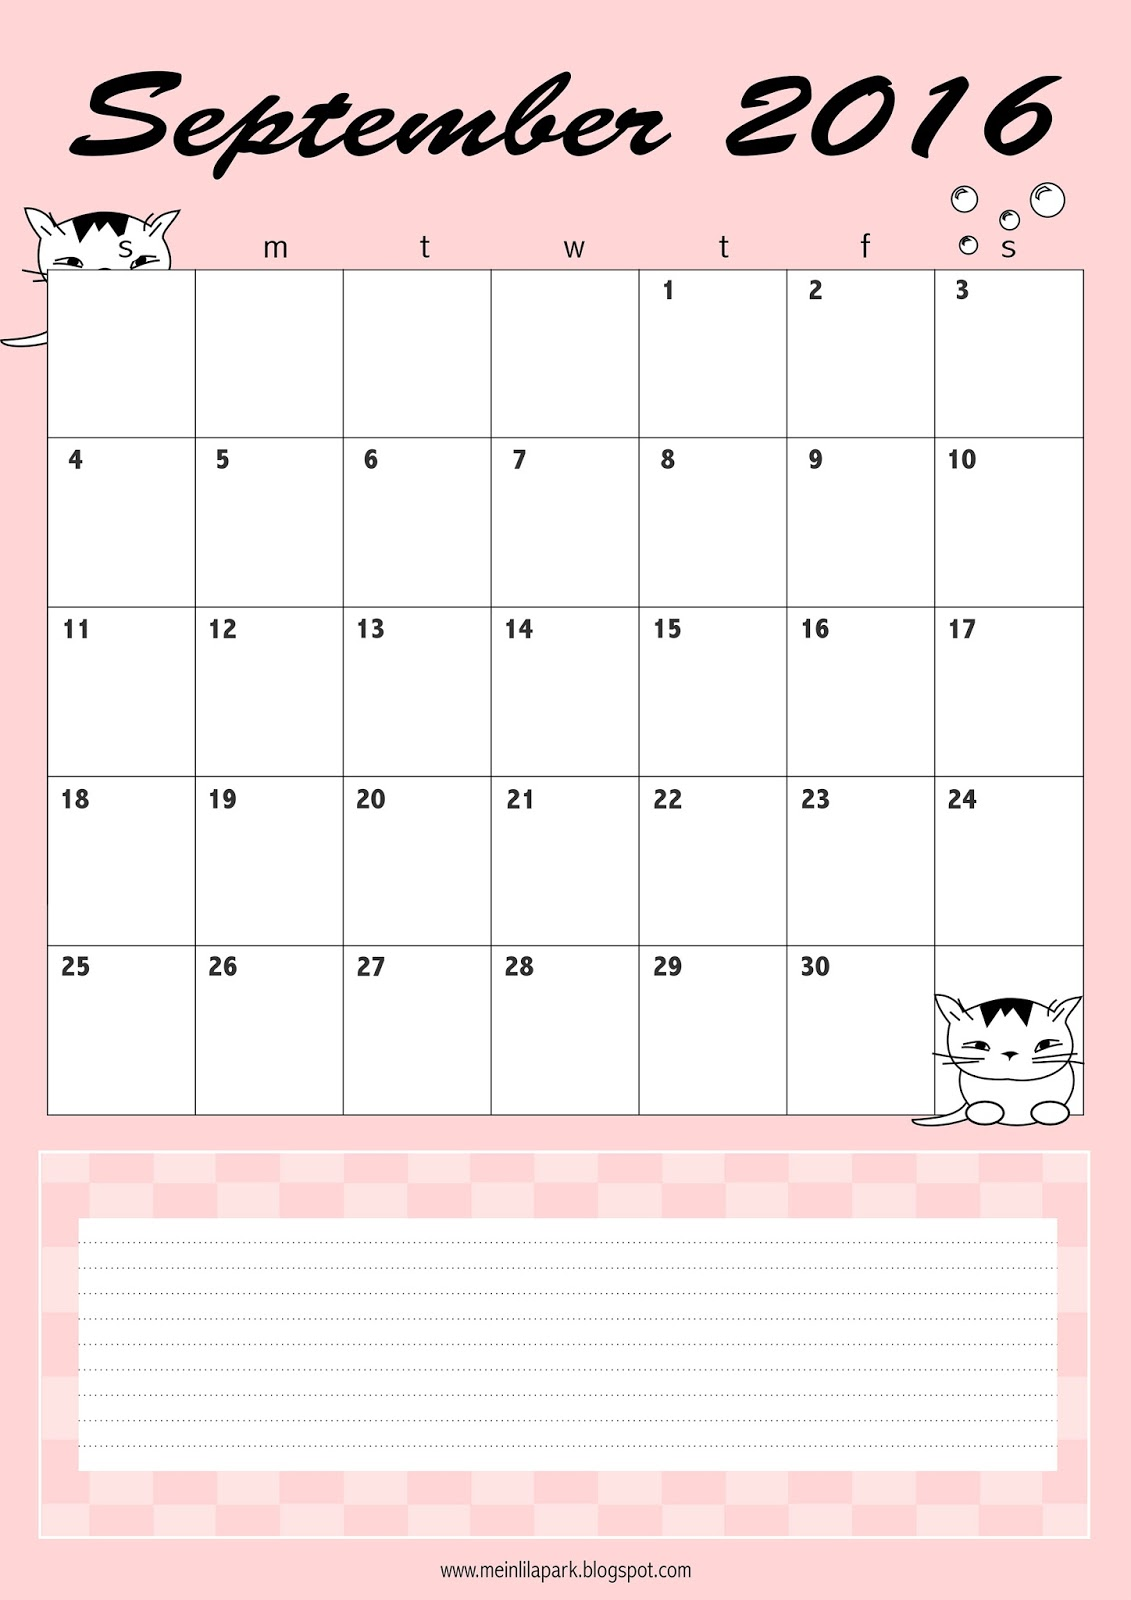 Calendar Planner September : Free printable september calendar planner freebie